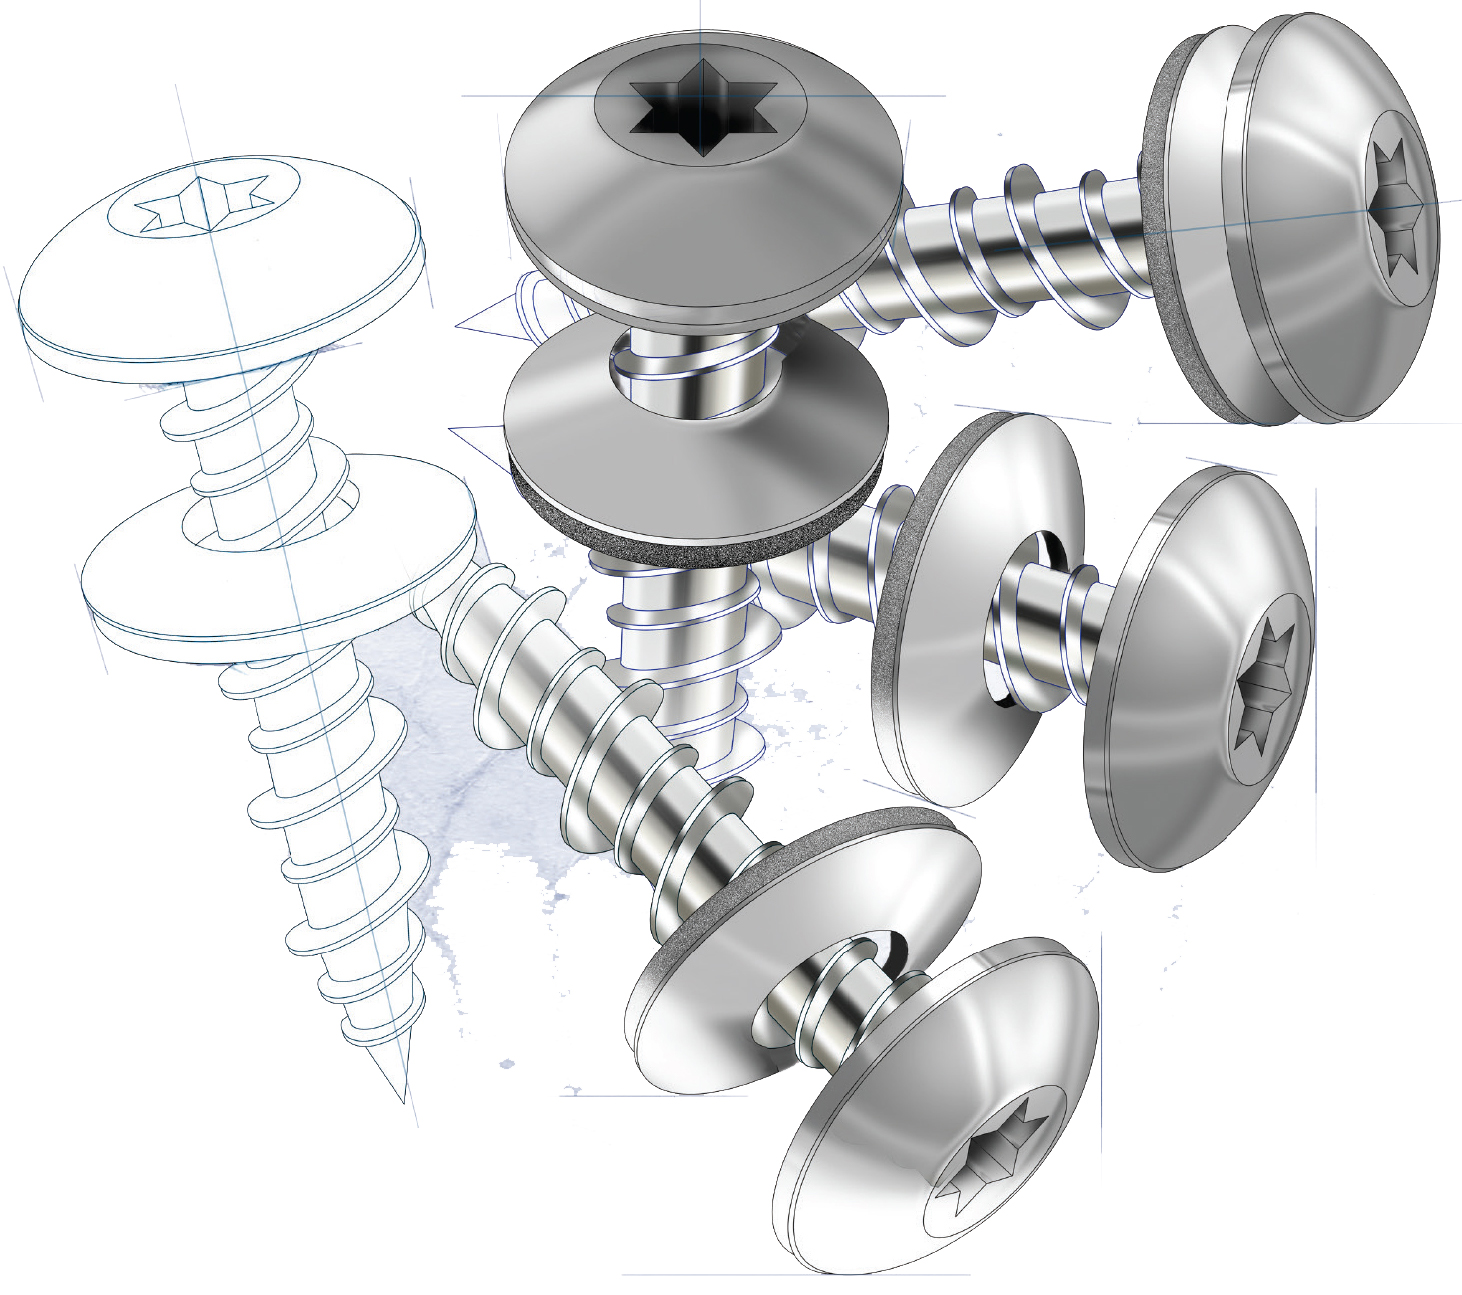 https://kentuckianabuilding.com/sites/kentuckianabuilding.com/assets/images/default/difference-fasteners.jpg